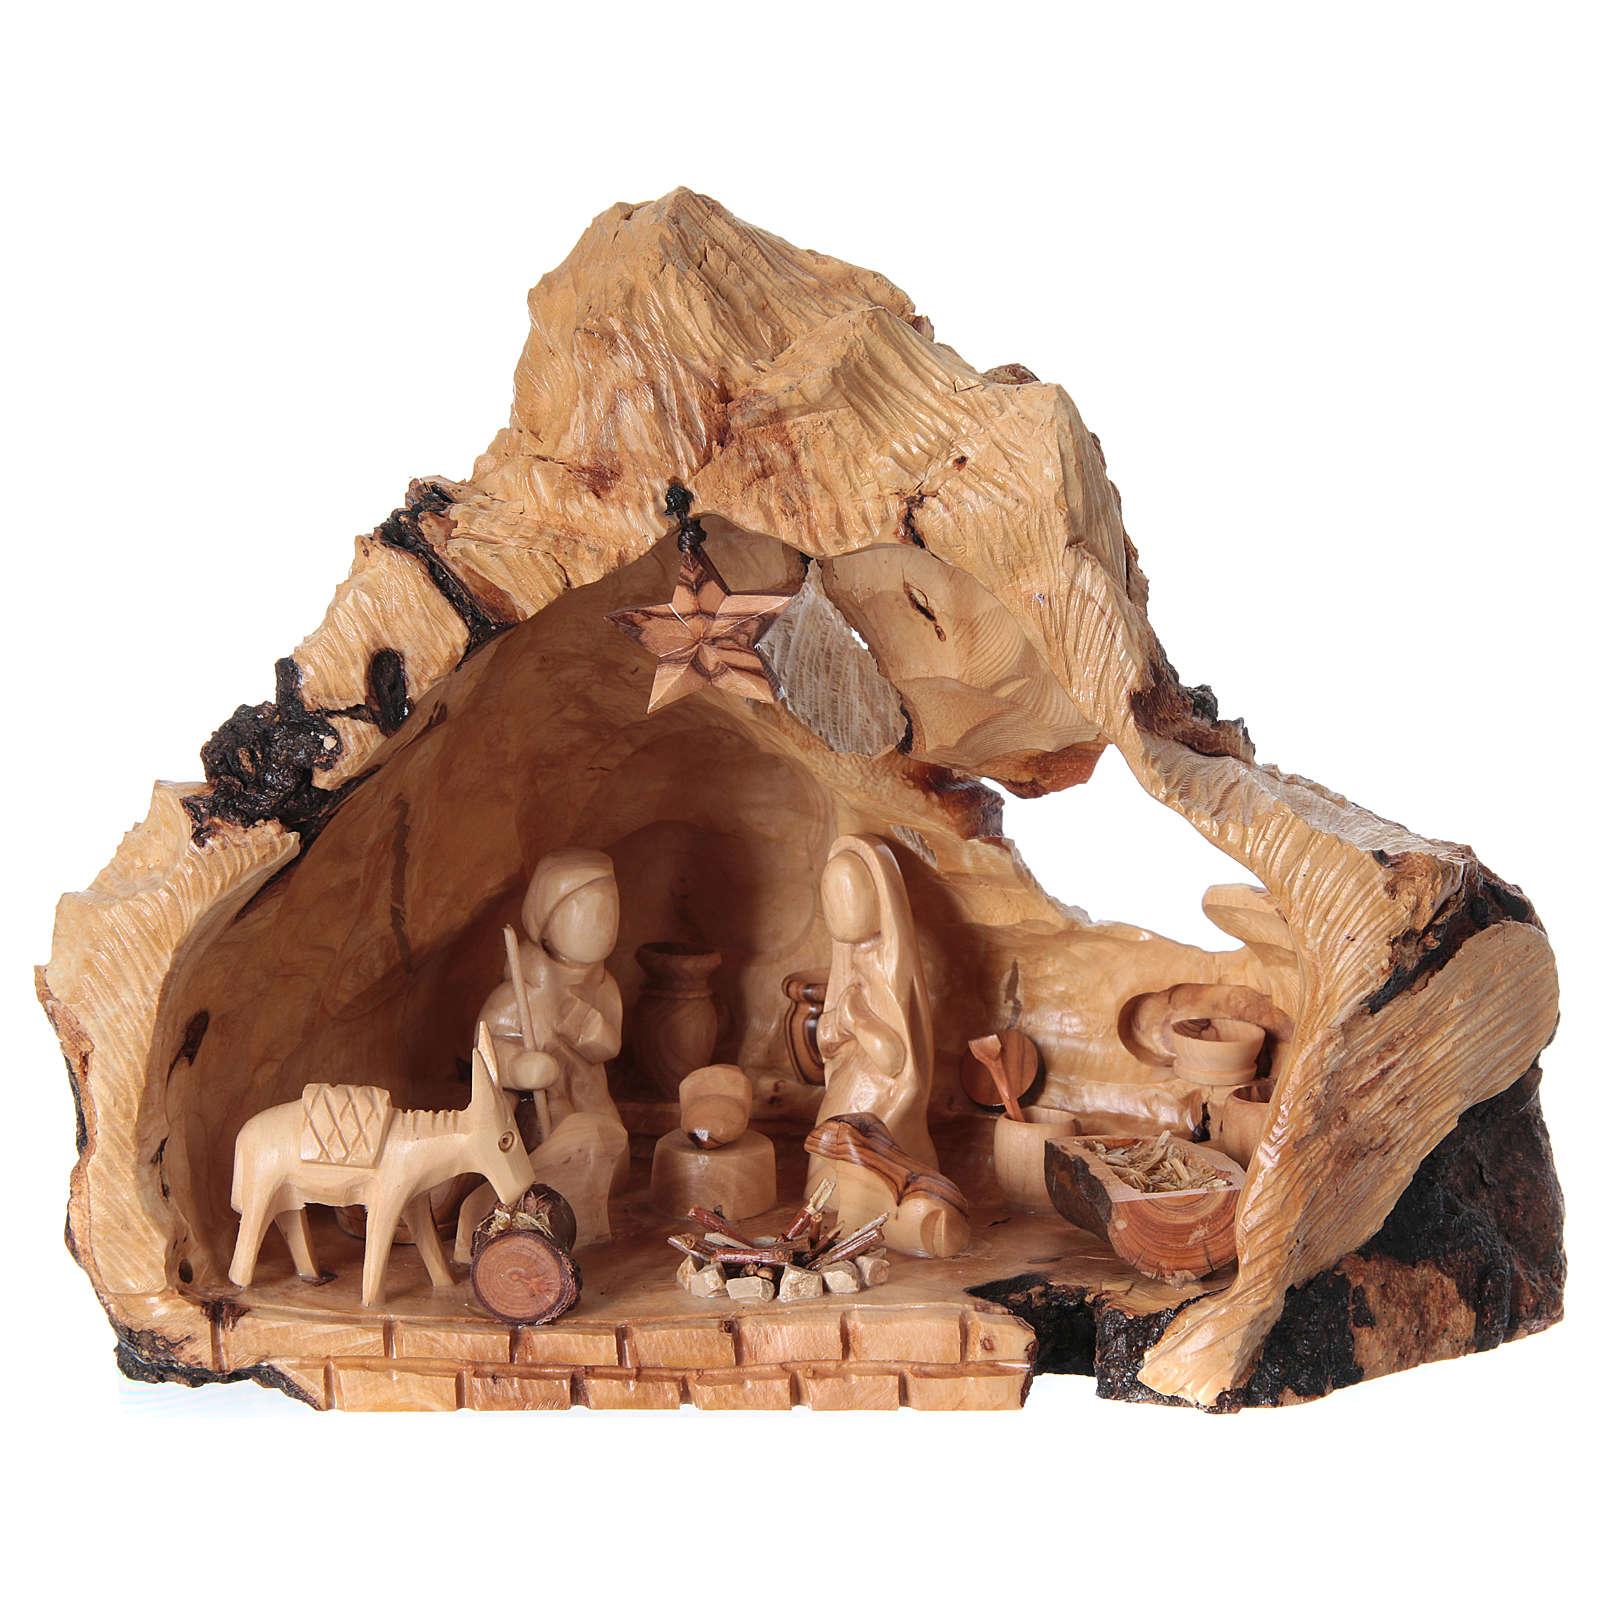 Natività ulivo di Betlemme in grotta forma irregolare 20x30x20 cm 4